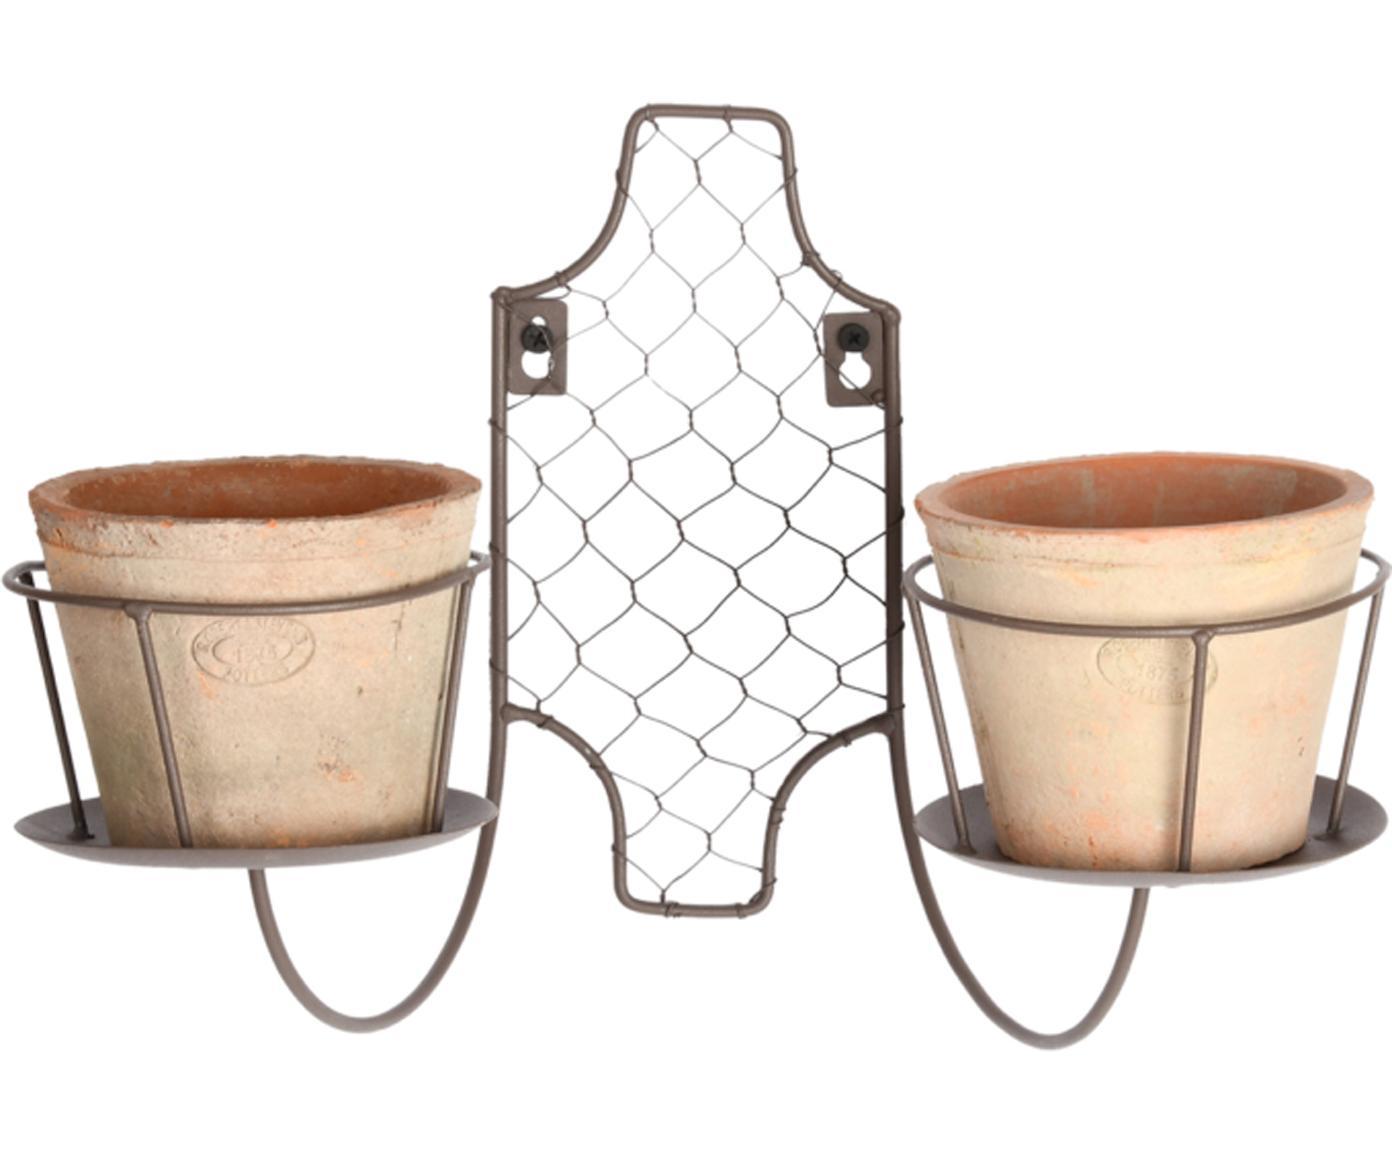 Set portavasi Daria 3 pz, Portavasi: terracotta, Terracotta, nero, Larg. 35 x Alt. 24 cm